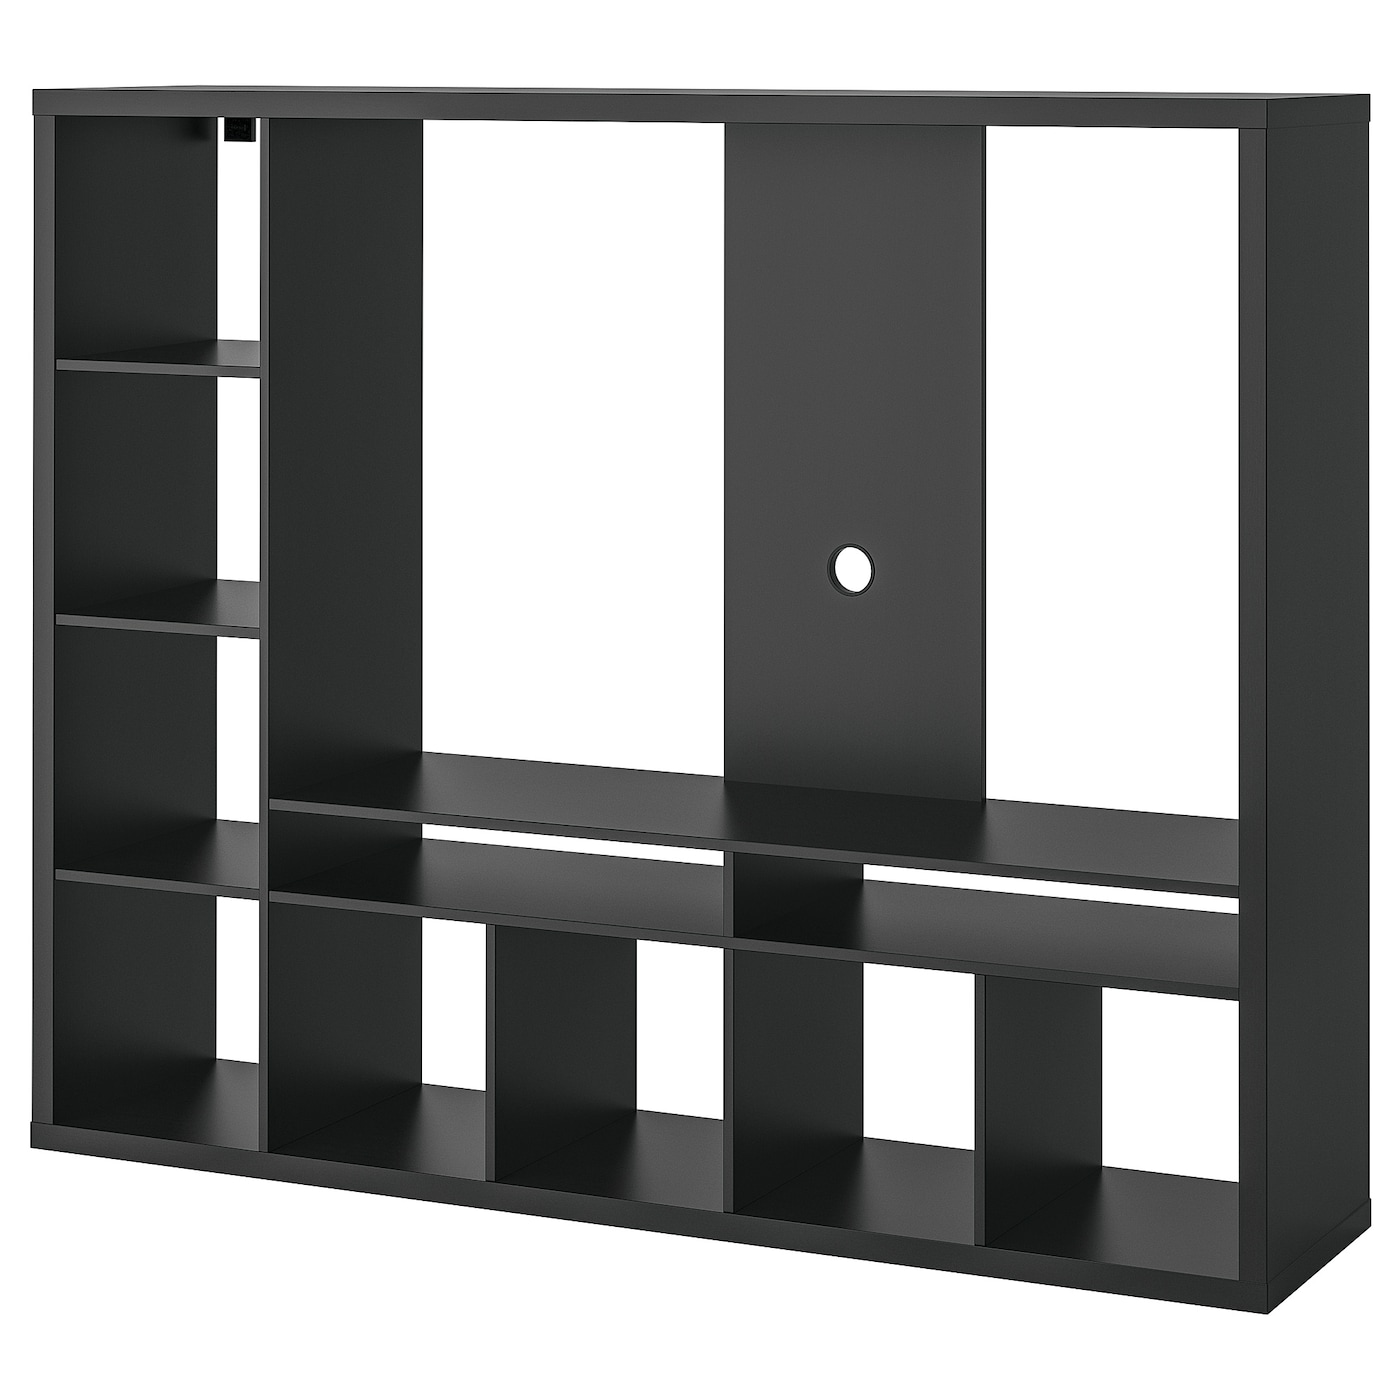 lappland tv storage unit black-brown 183 x 39 x 147 cm - ikea